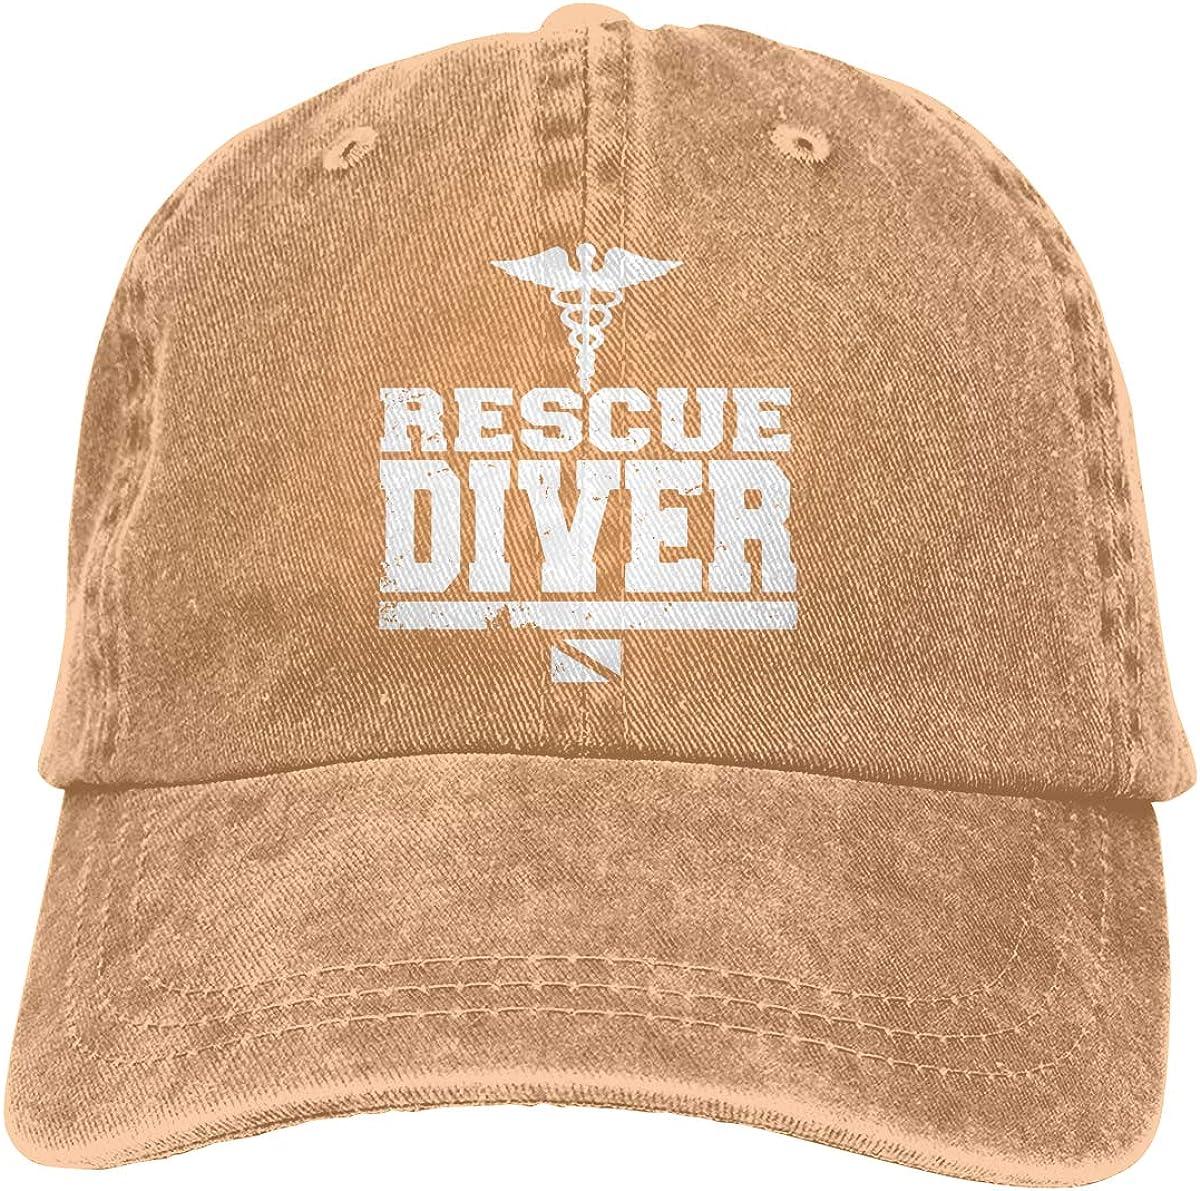 Rescue Diver Retro Denim Baseball Hat Trucker Hat Dad Hat Adjustable